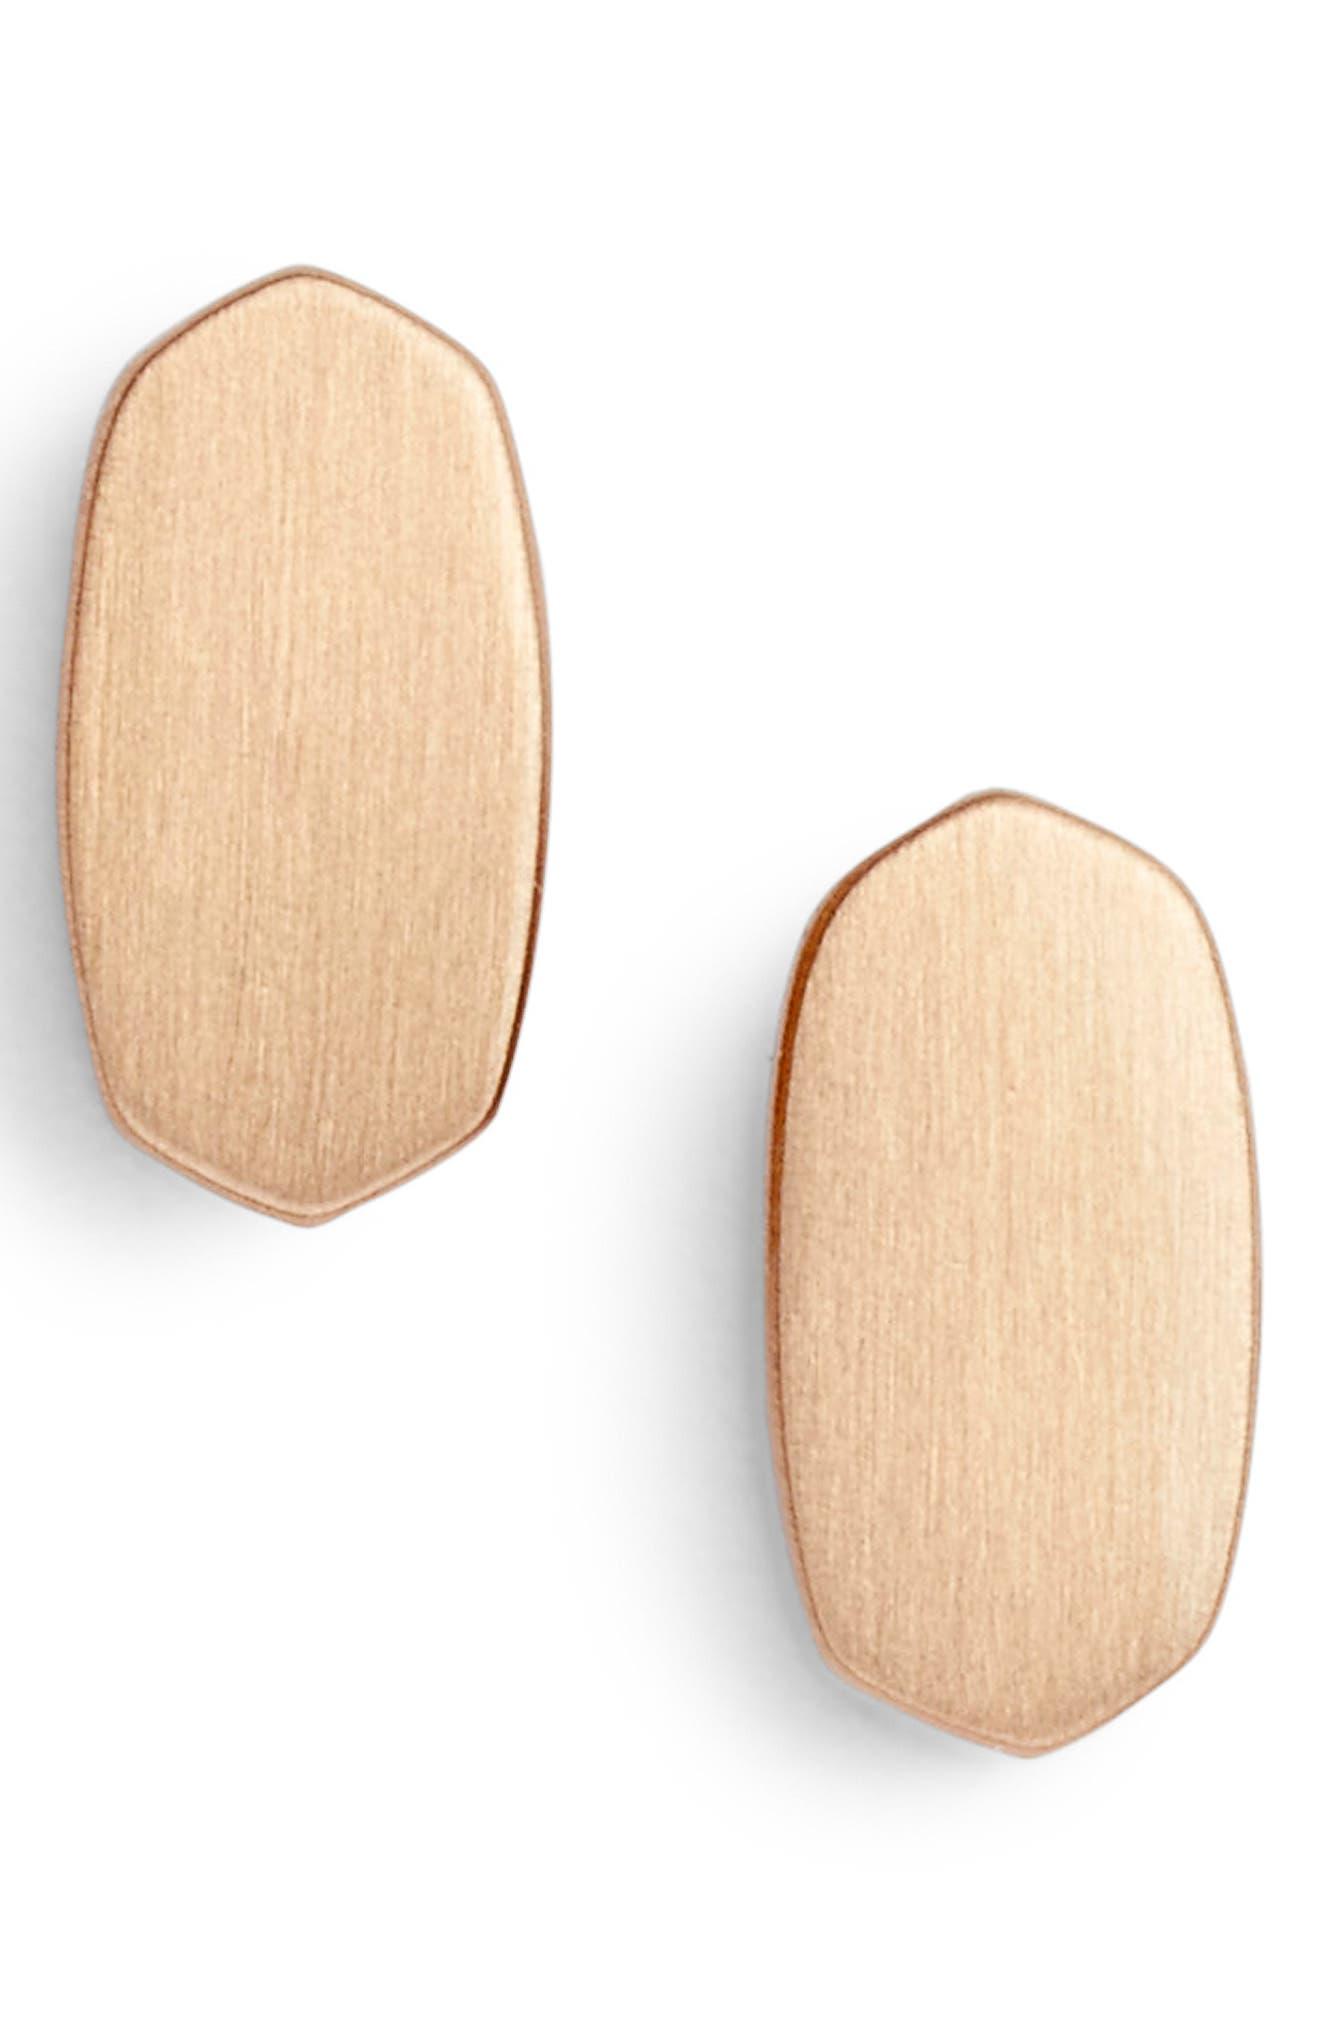 Main Image - Kendra Scott Barrett Stud Earrings